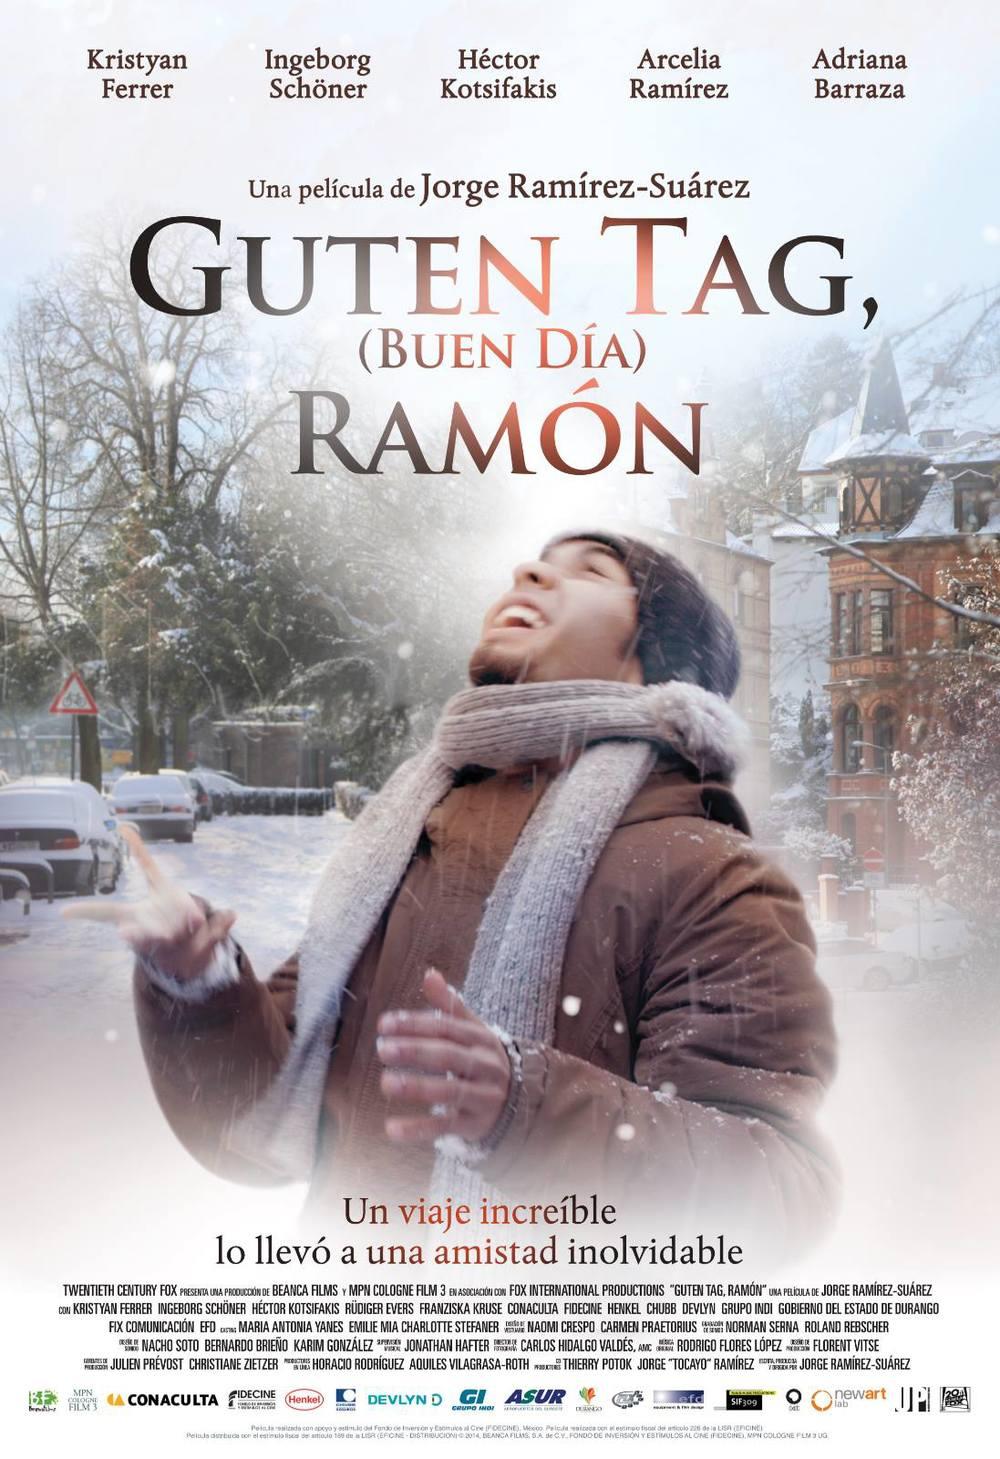 Guten Tag, Ramón (Feature Film)